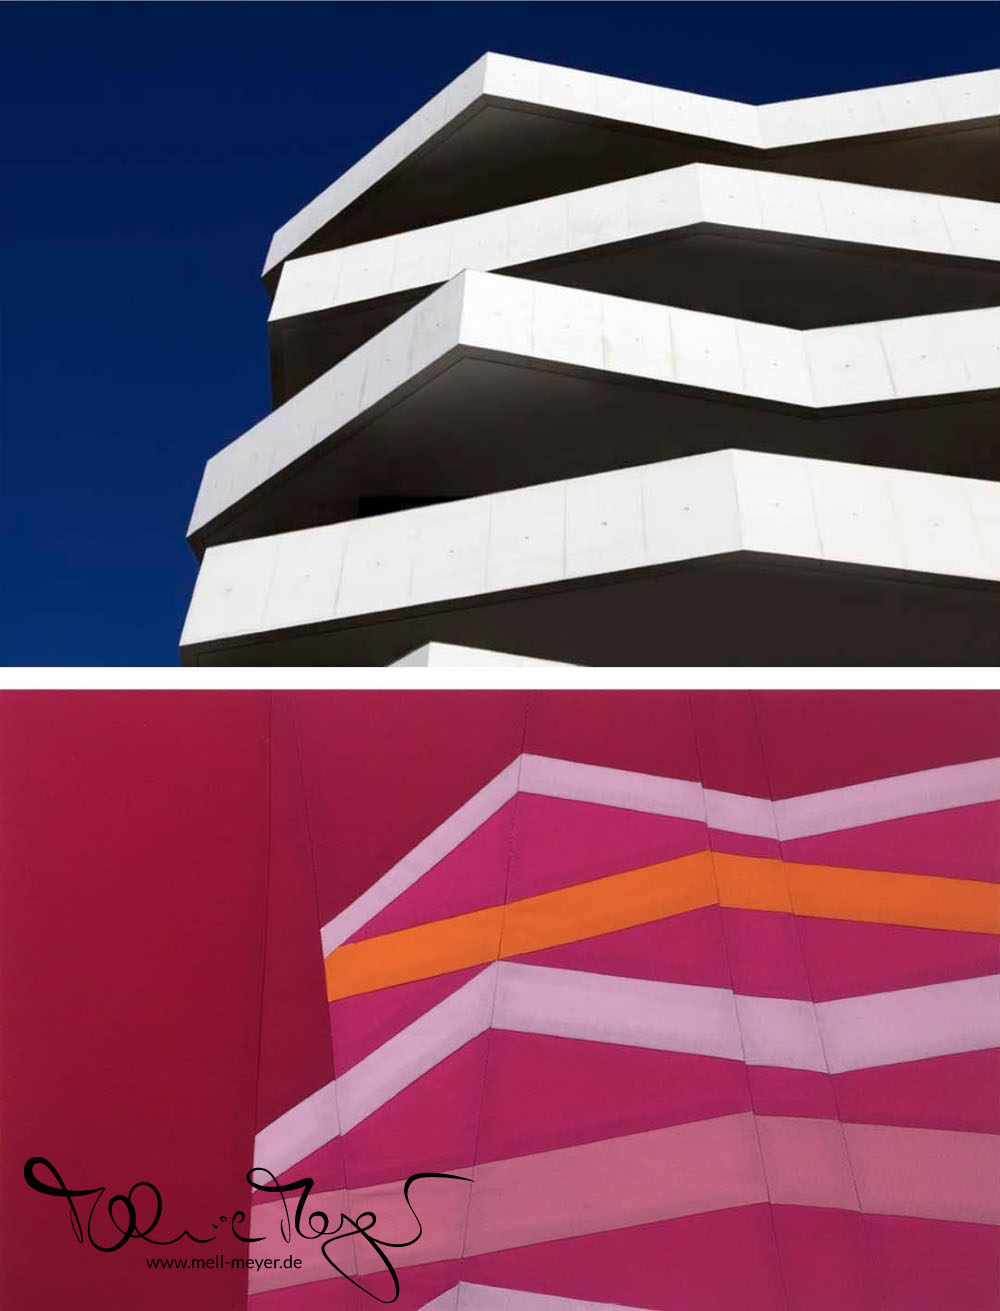 "#improvbee - Q1 2017 ""Minimalistic Architecture"" | mell-meyer.de"